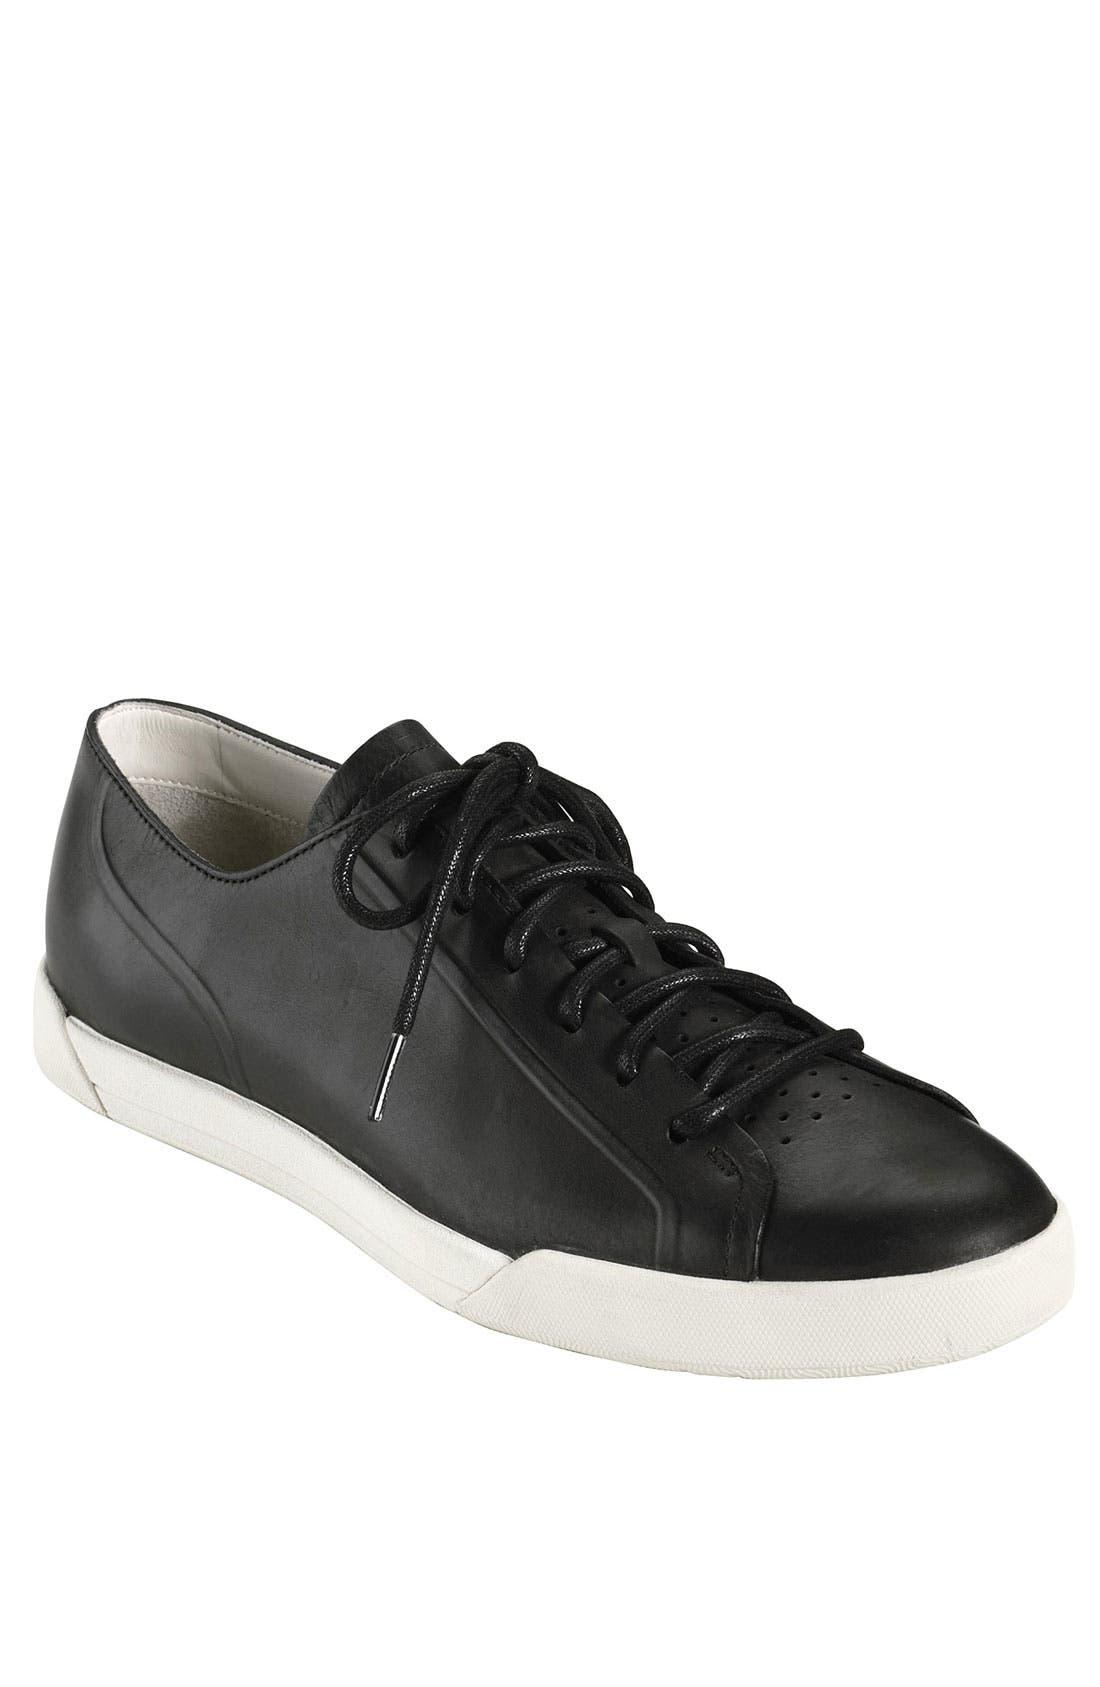 Main Image - Cole Haan 'Air Jasper Low' Sneaker